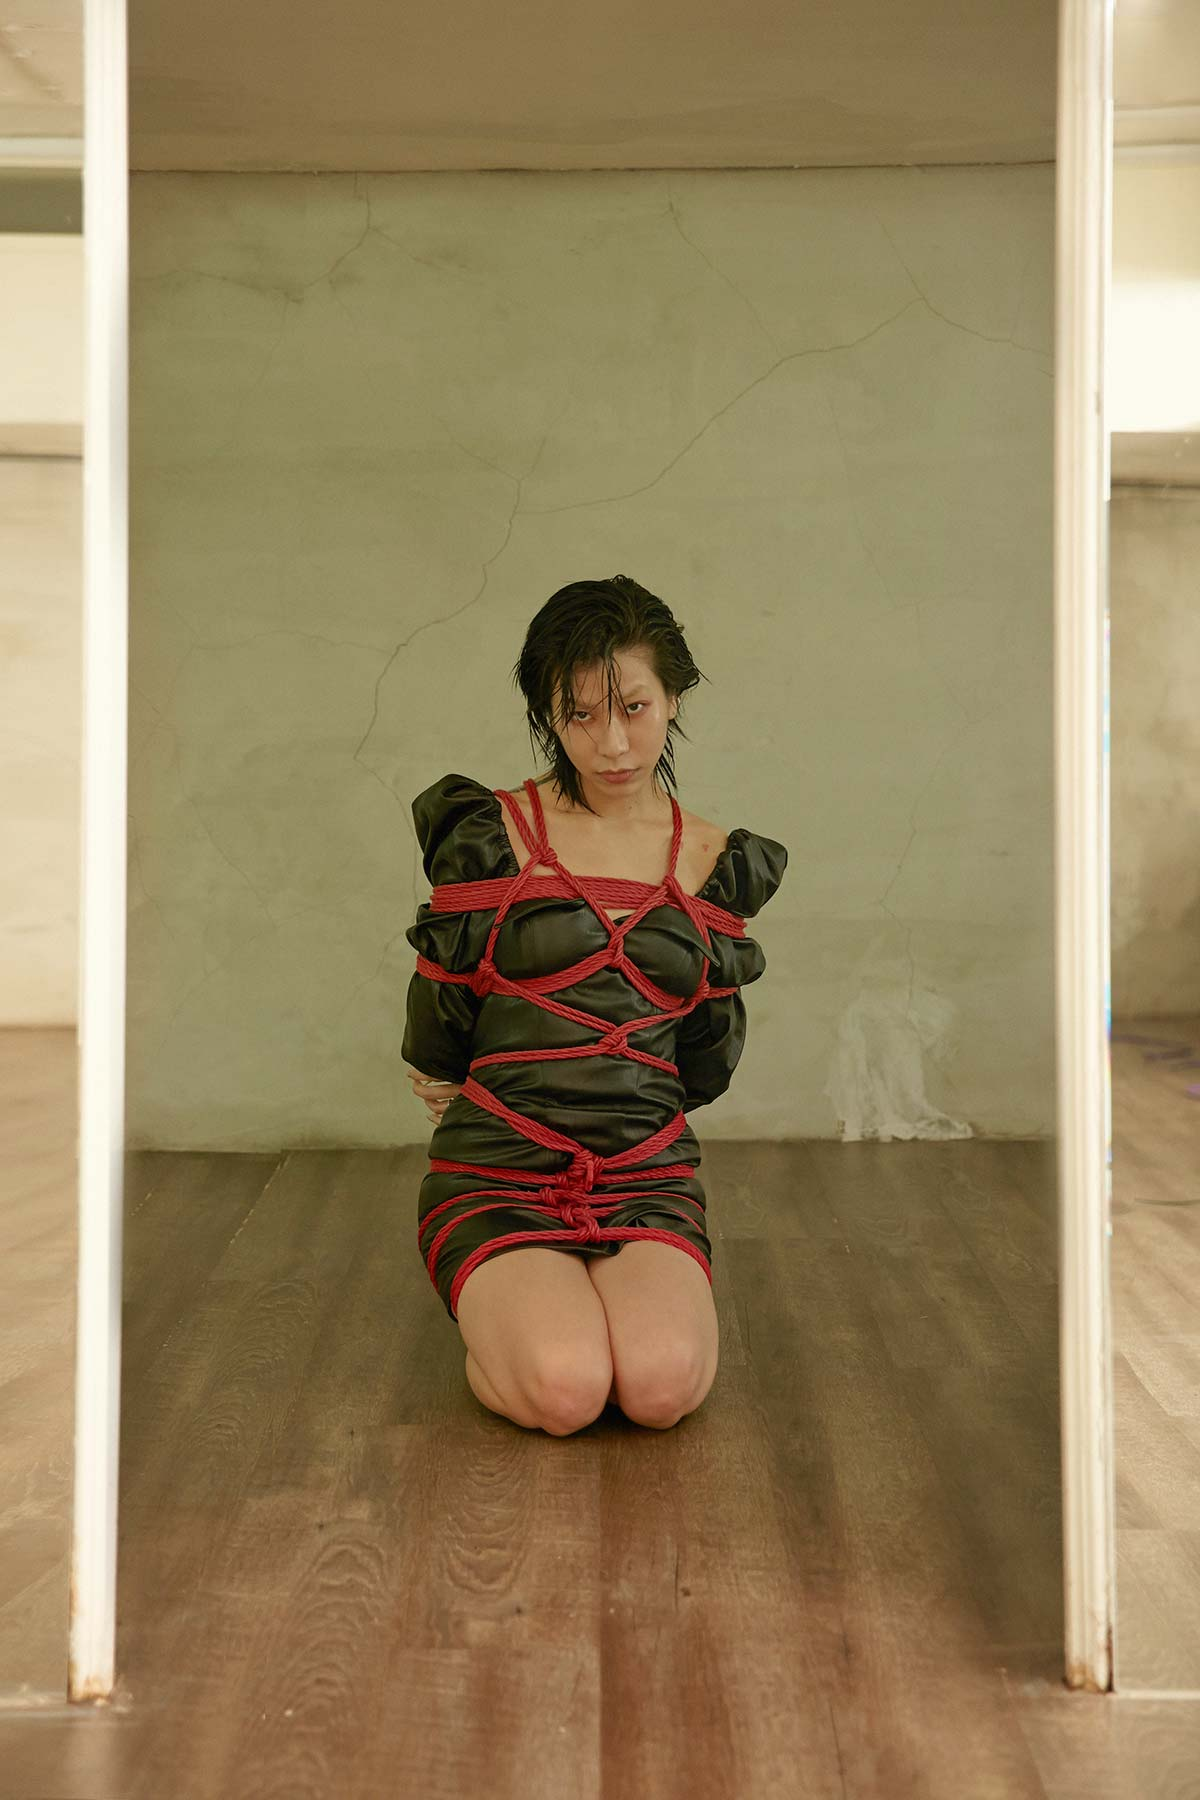 jenn lee, shibari ties, shibari knots, shibari design, fashion designer, taiwan designer, dennis fei